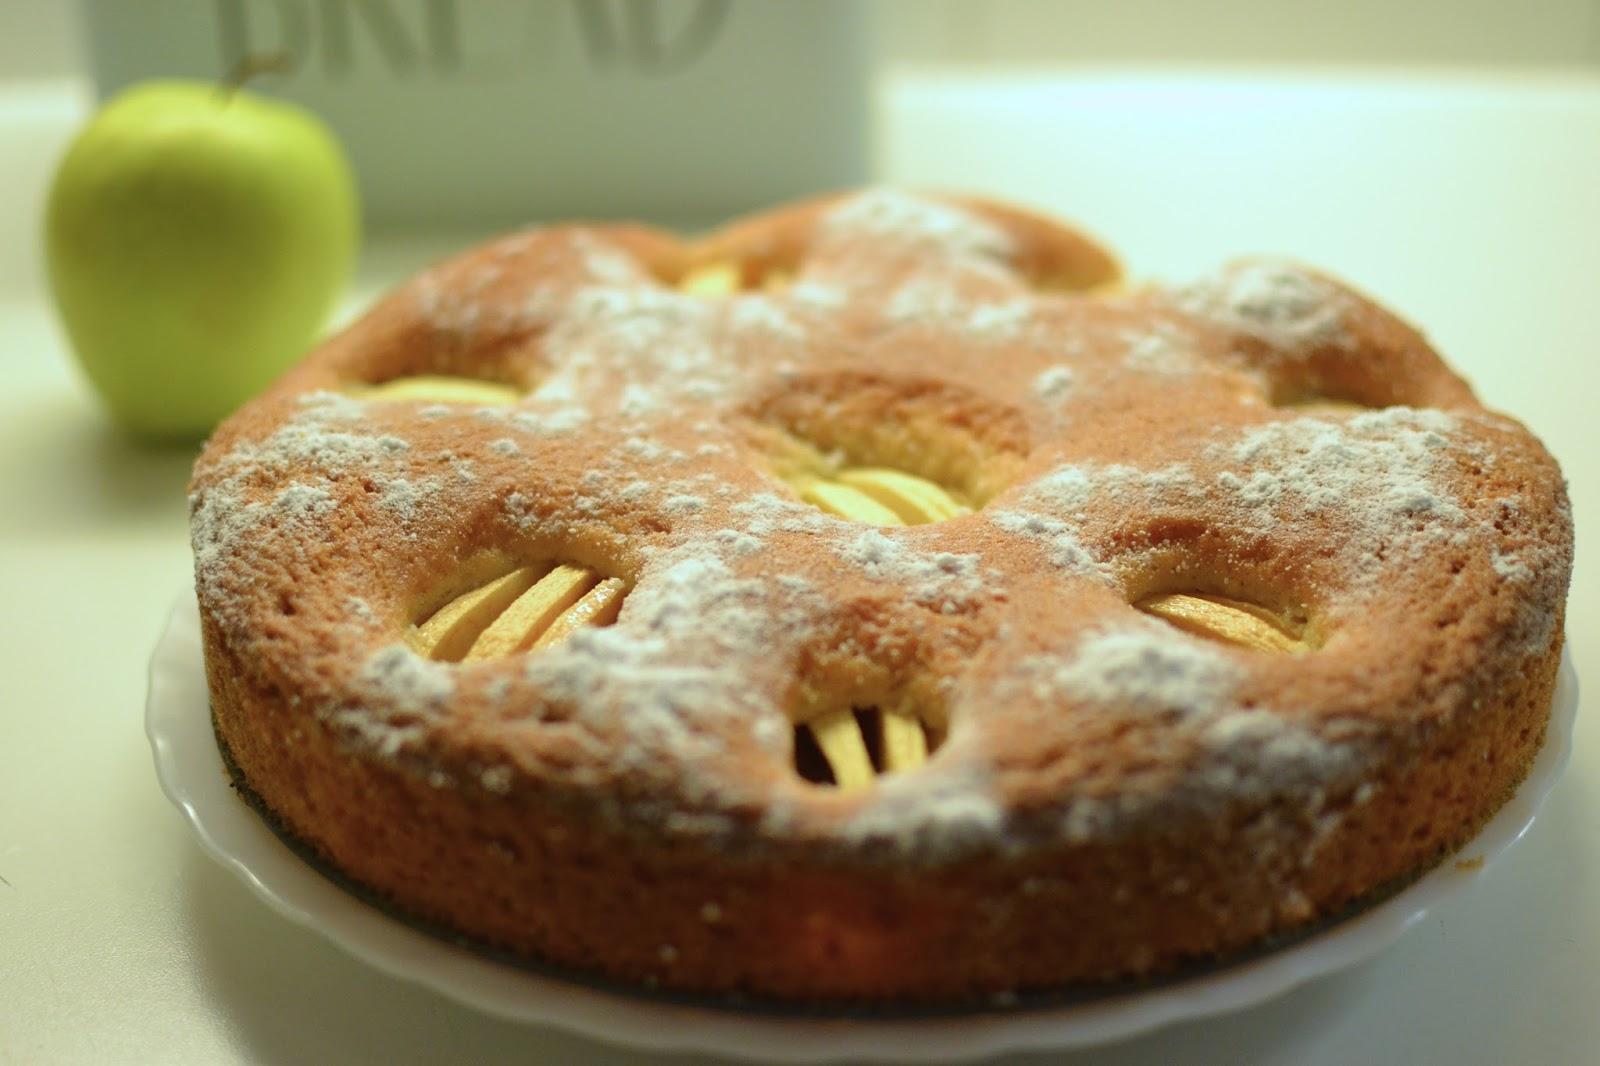 Mis recetas: tarta bizocho de manzana - A Golpe de Objetivo